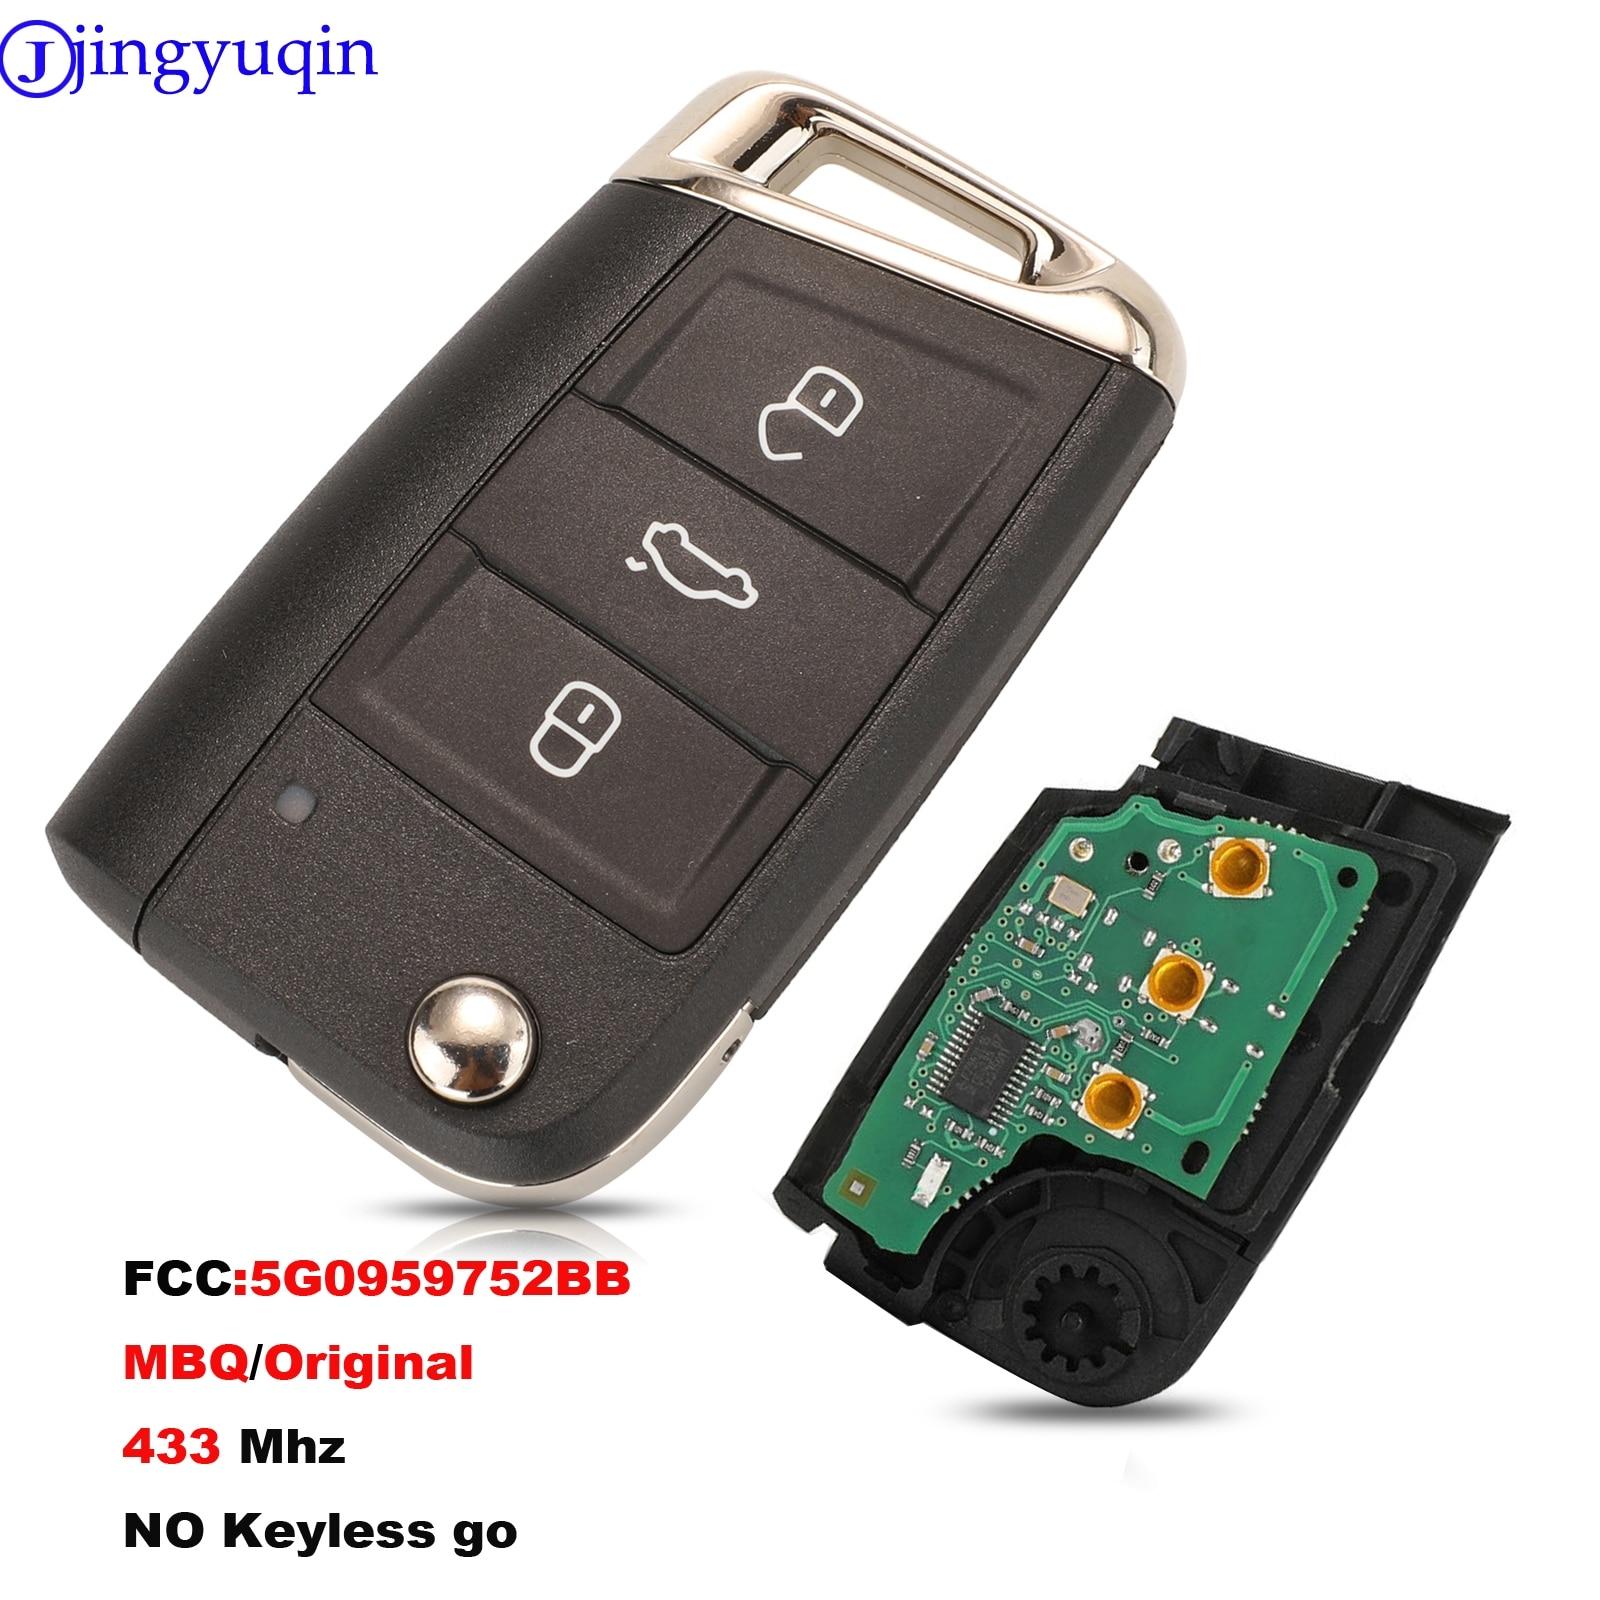 Jingyuqin 433Mhz 3 أزرار مفتاح السيارة عن بعد ل VW Golf 7 MK7 سكودا اوكتافيا A7 مقعد 5G0959752BB MBQ الأصلي لا الذهاب بدون مفتاح